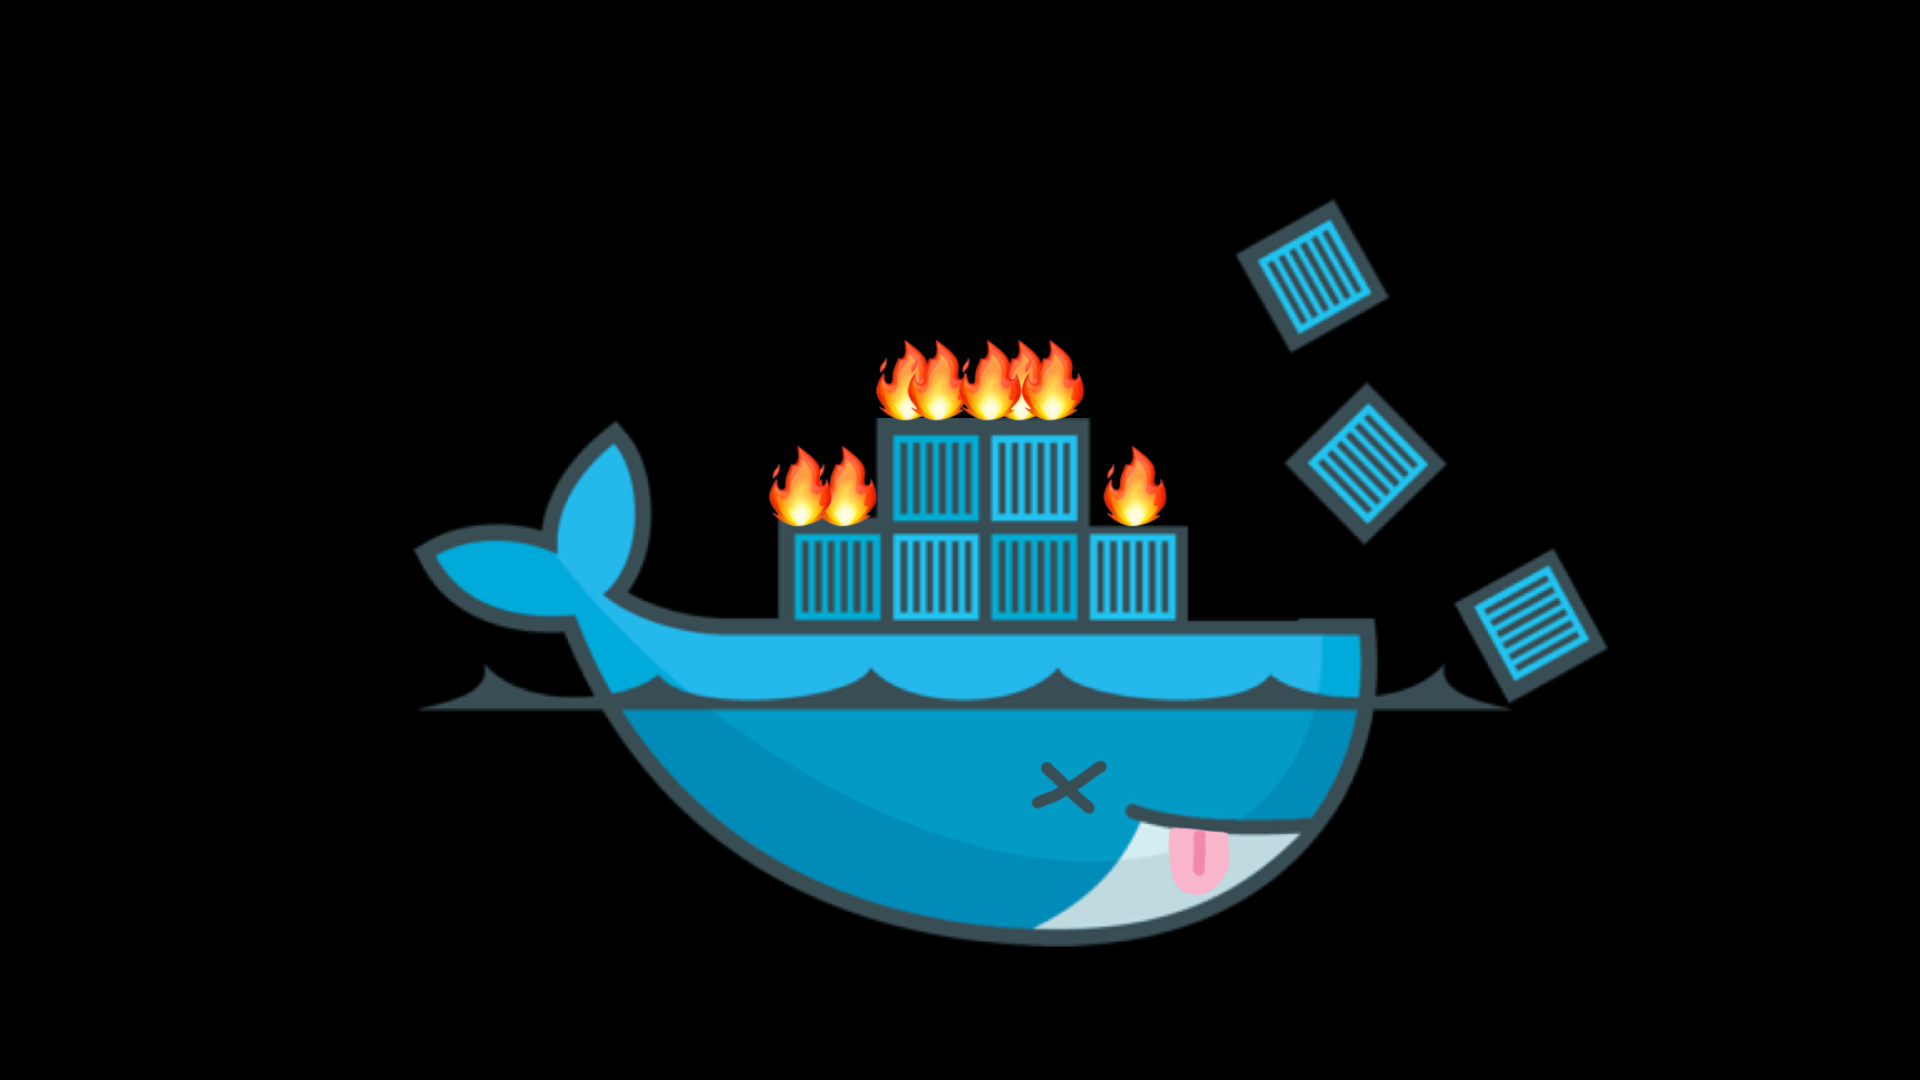 Docker Hub breach impacting at least 190,000 accounts